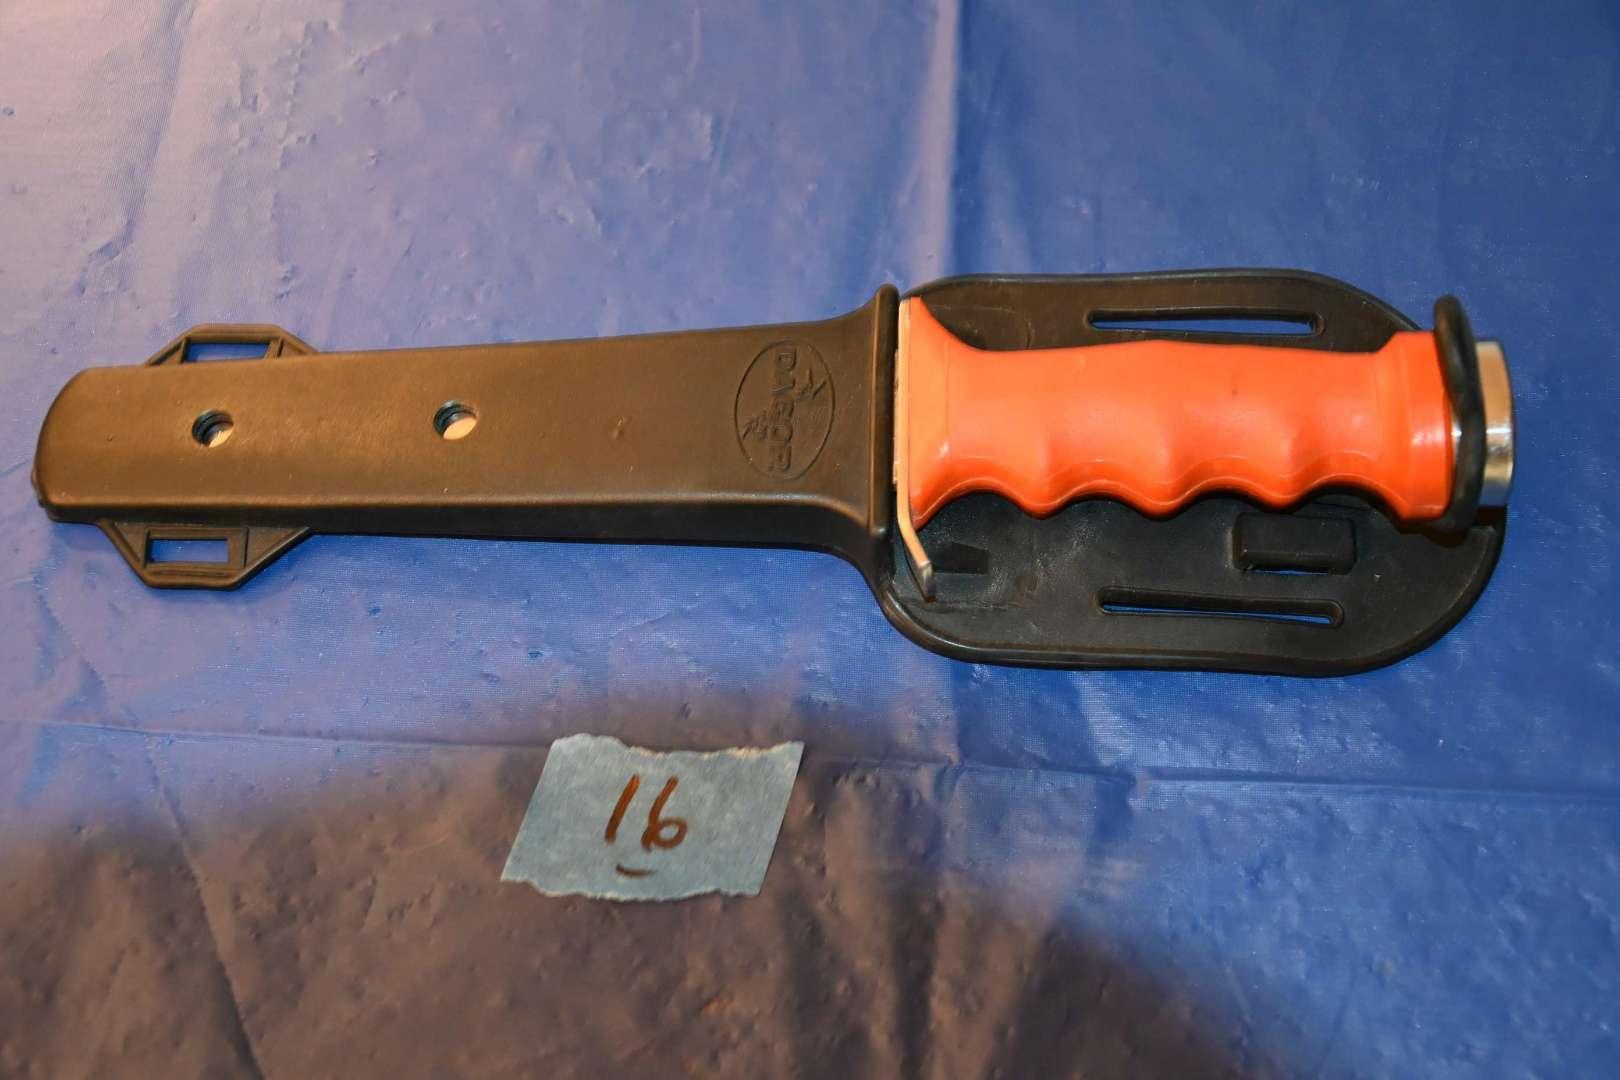 Lot # 16 DACOR scuba knife with sheath ORANGE handle